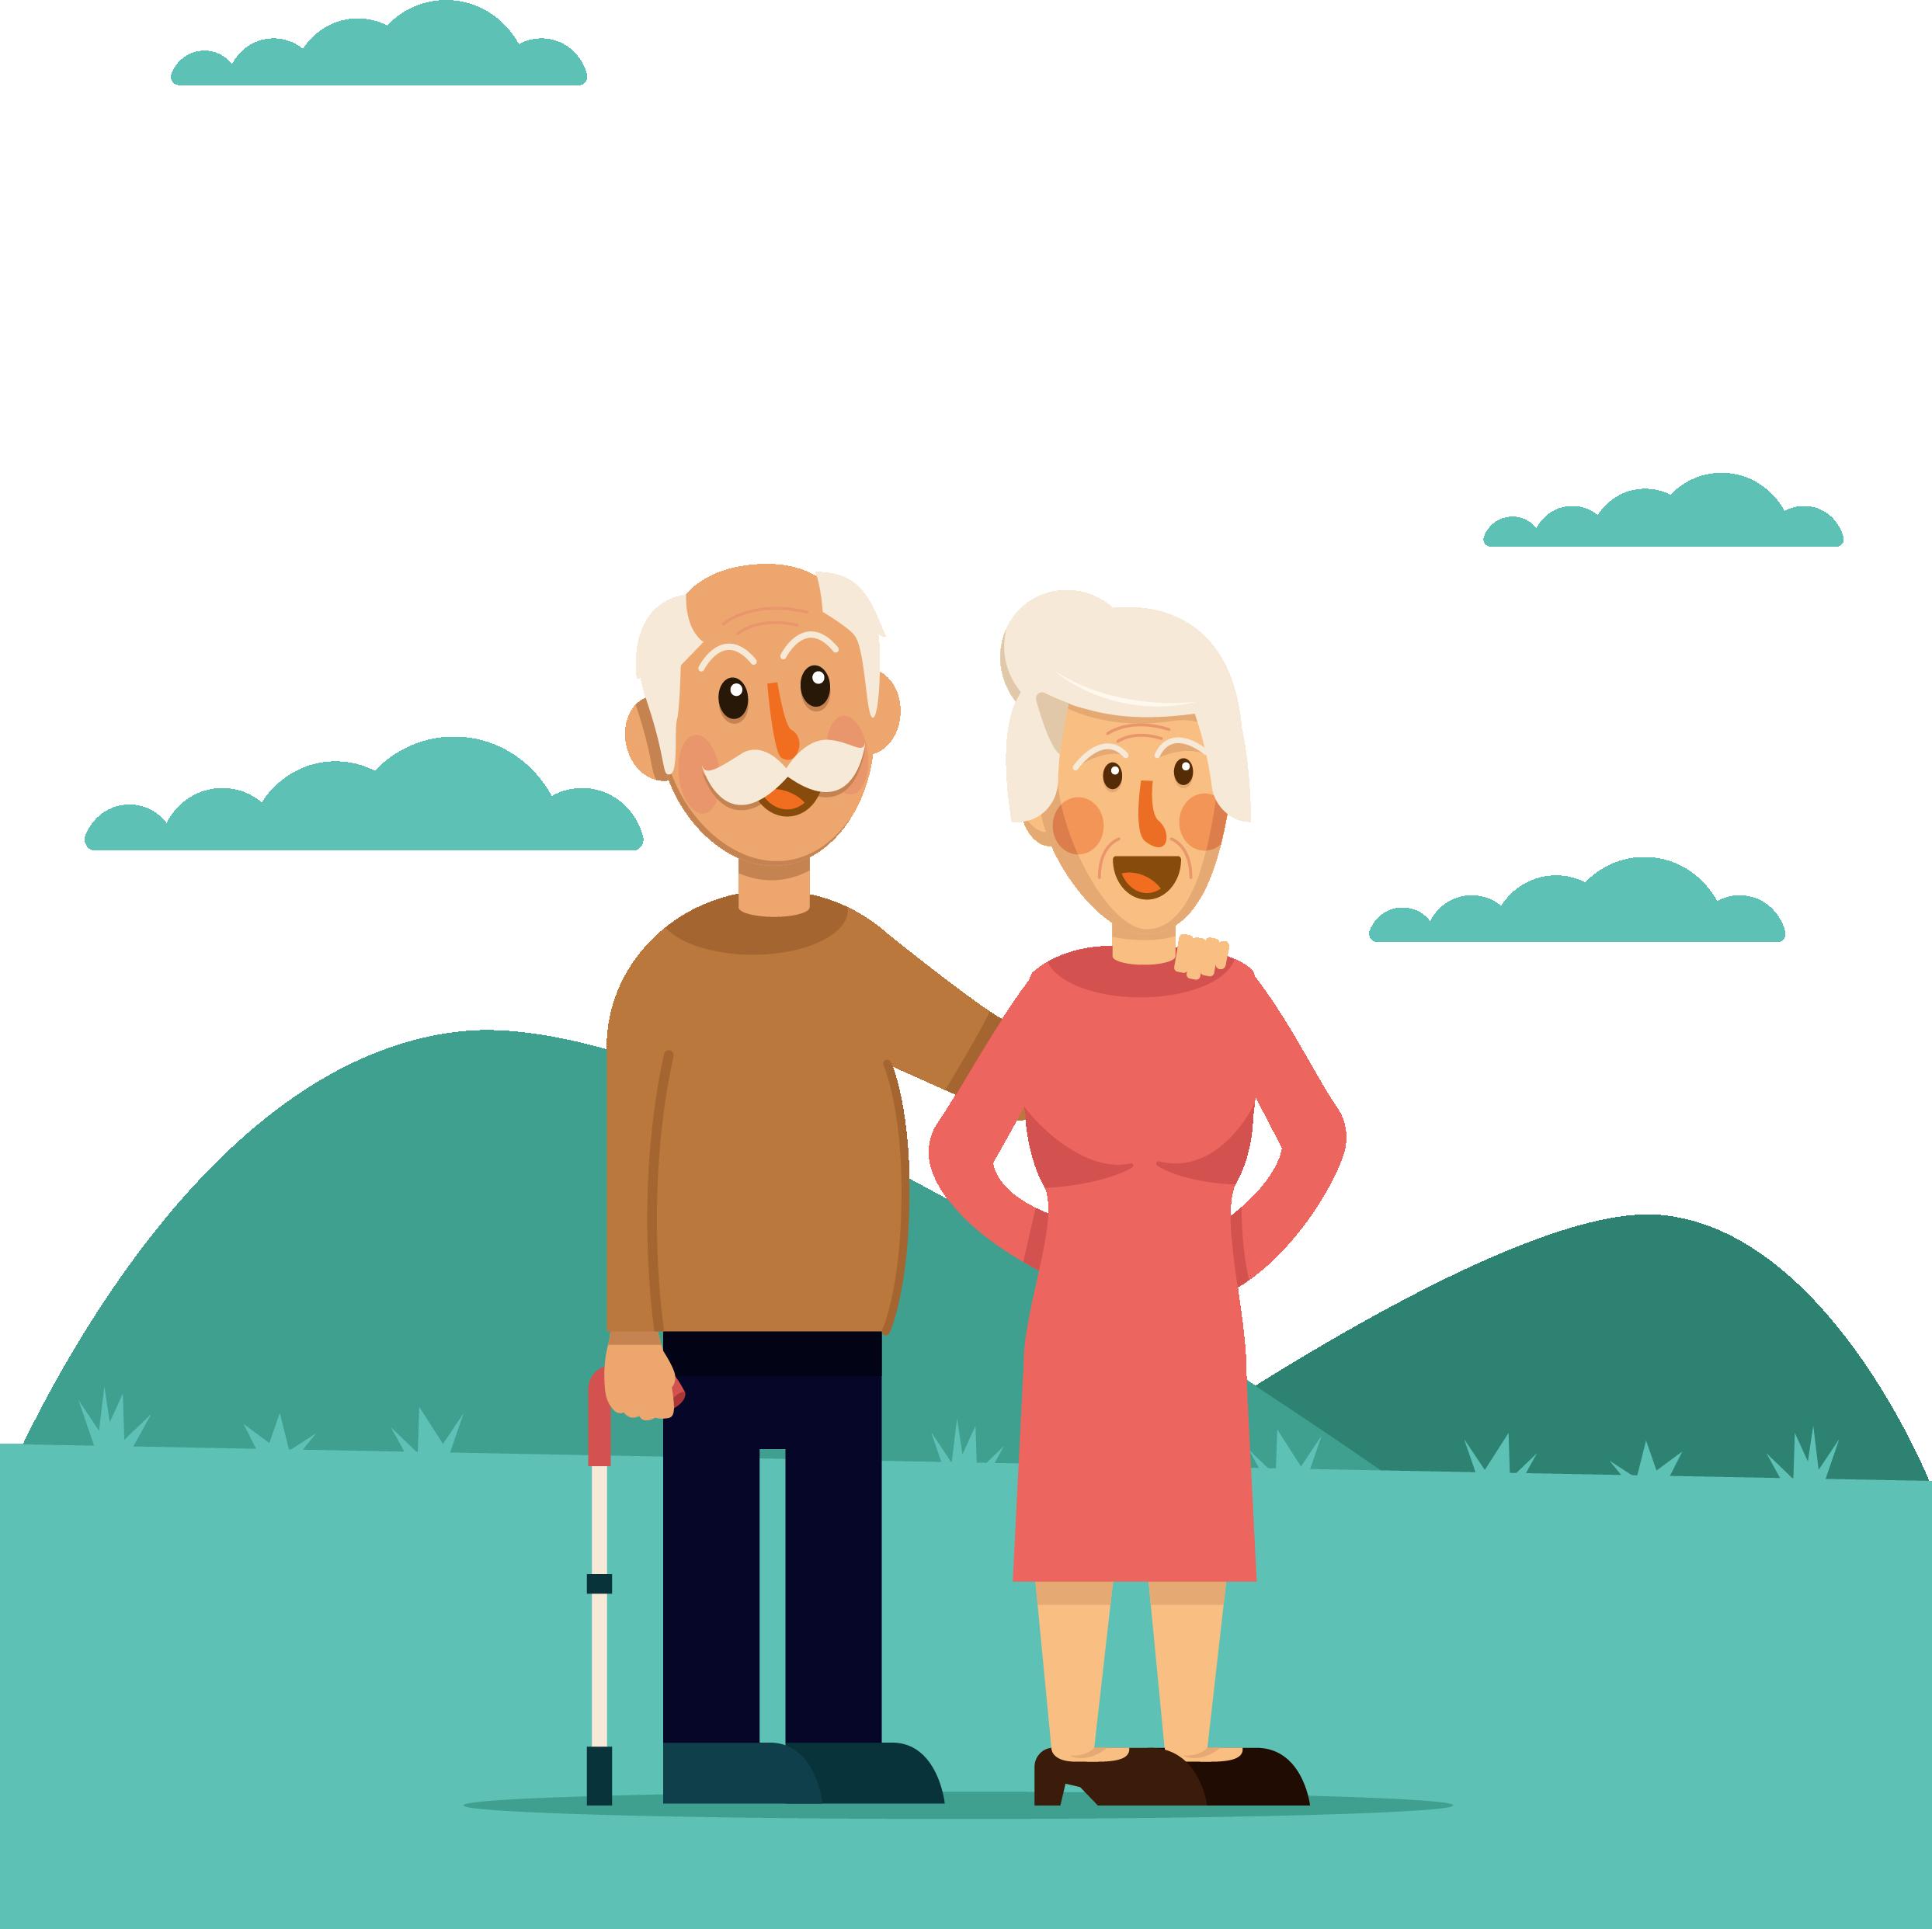 Clipart walking family. Adobe illustrator clip art